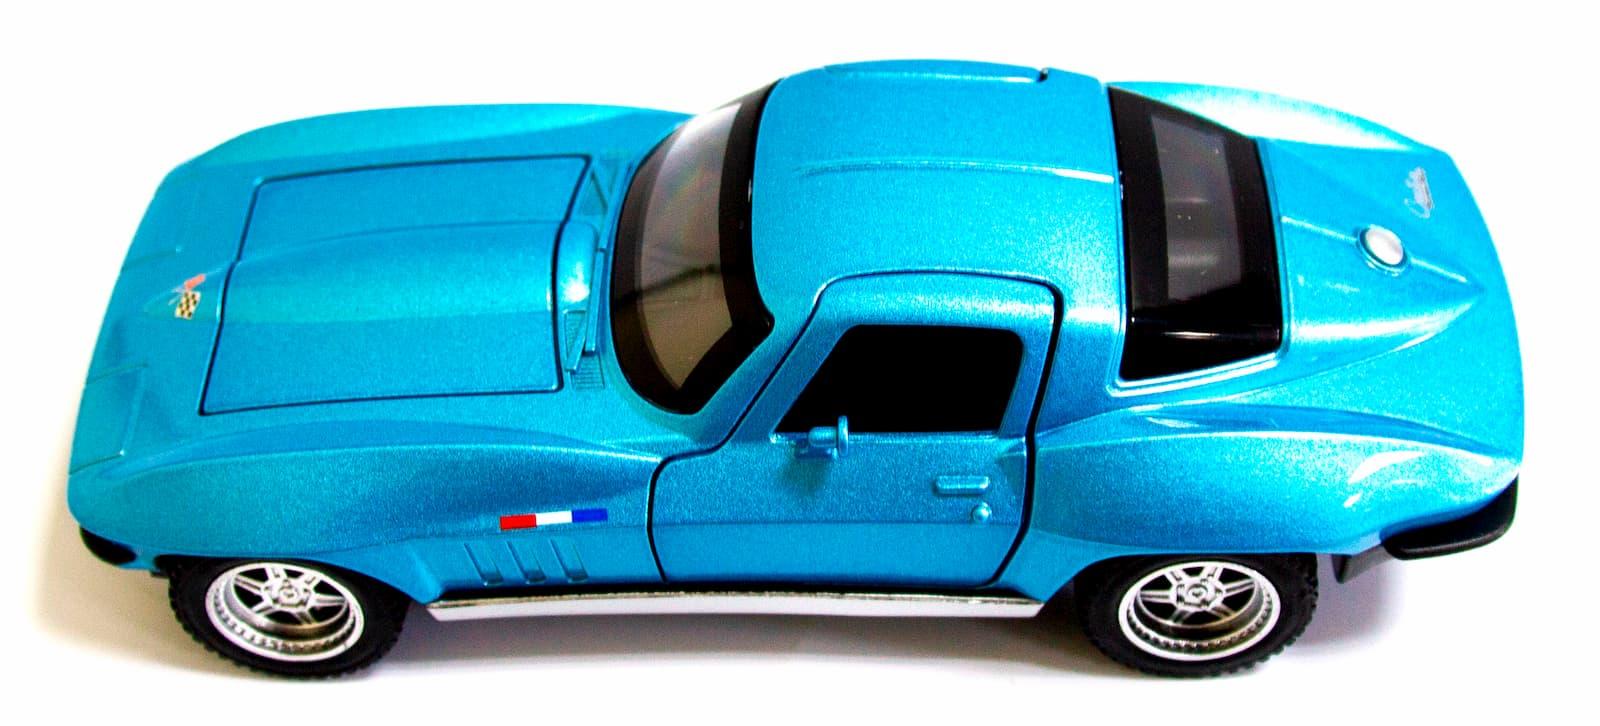 Машинка металлическая Double Horses 1:32 «1964 Chevrolet Corvette C2 Sting Ray» 32411 инерционная, свет, звук / Микс